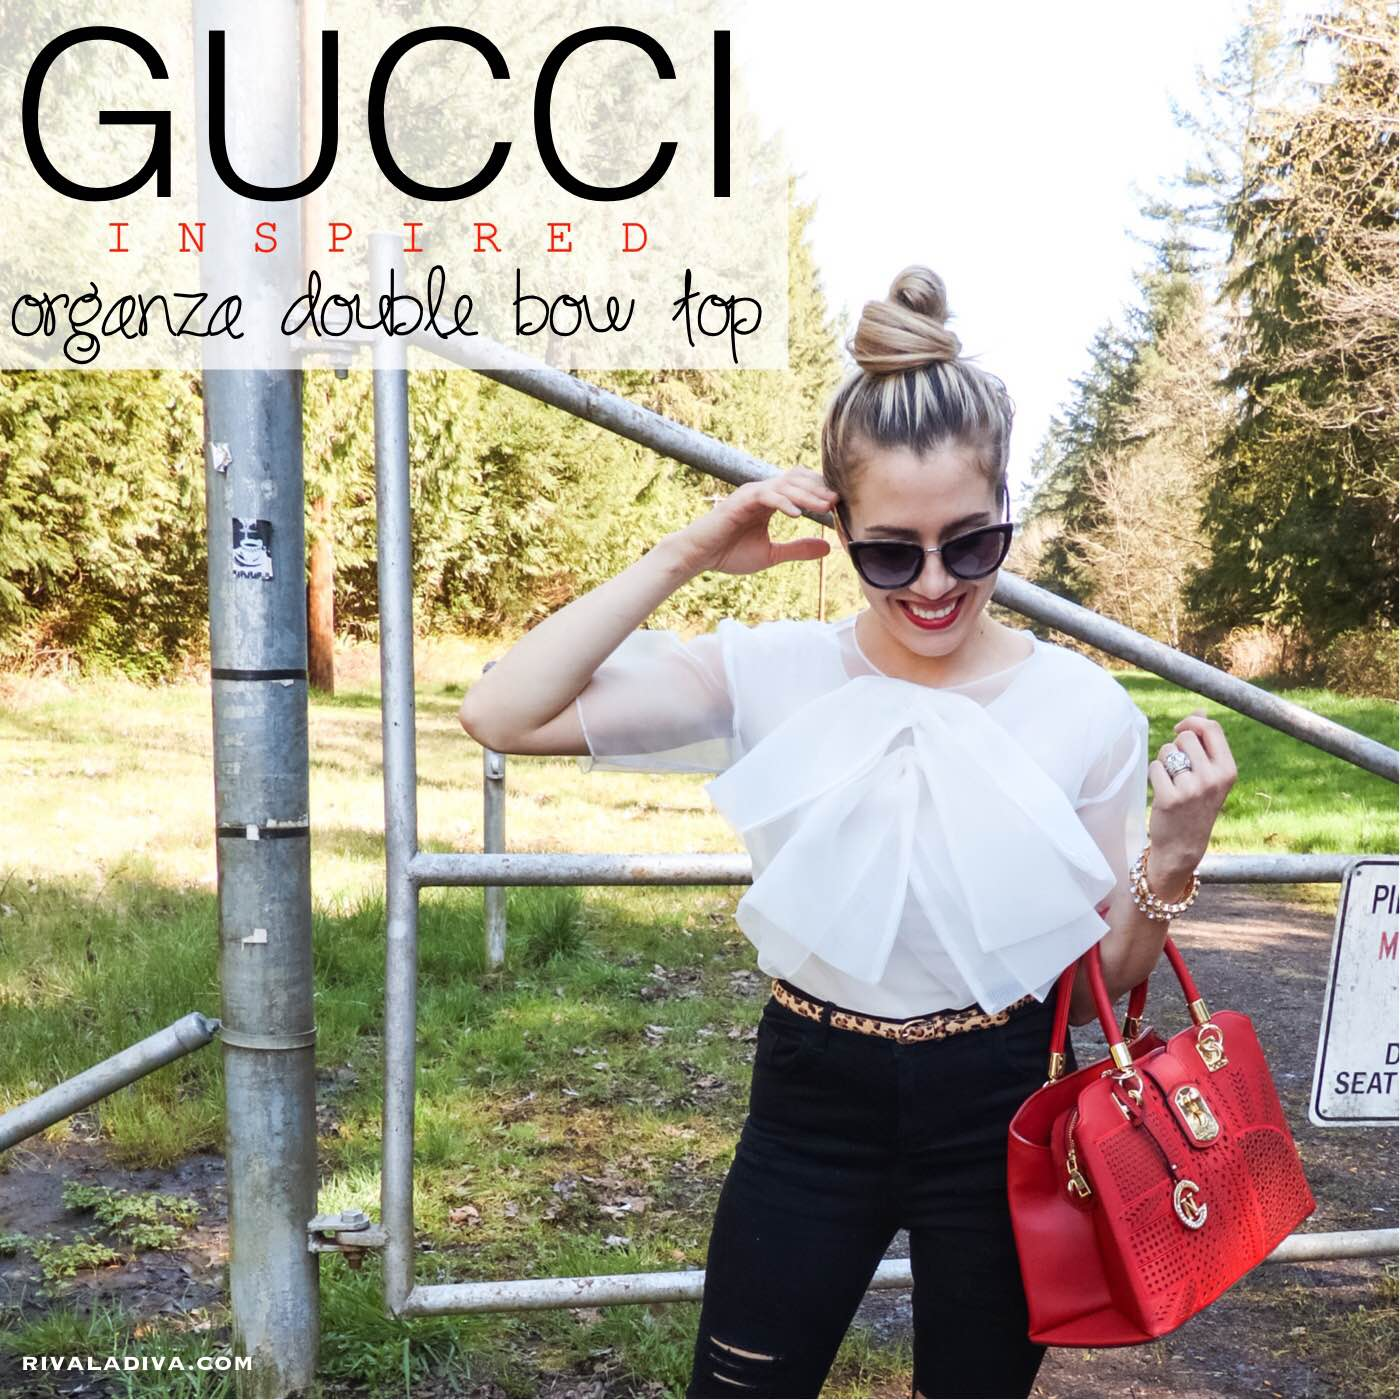 Gucci Organza Double Bow top